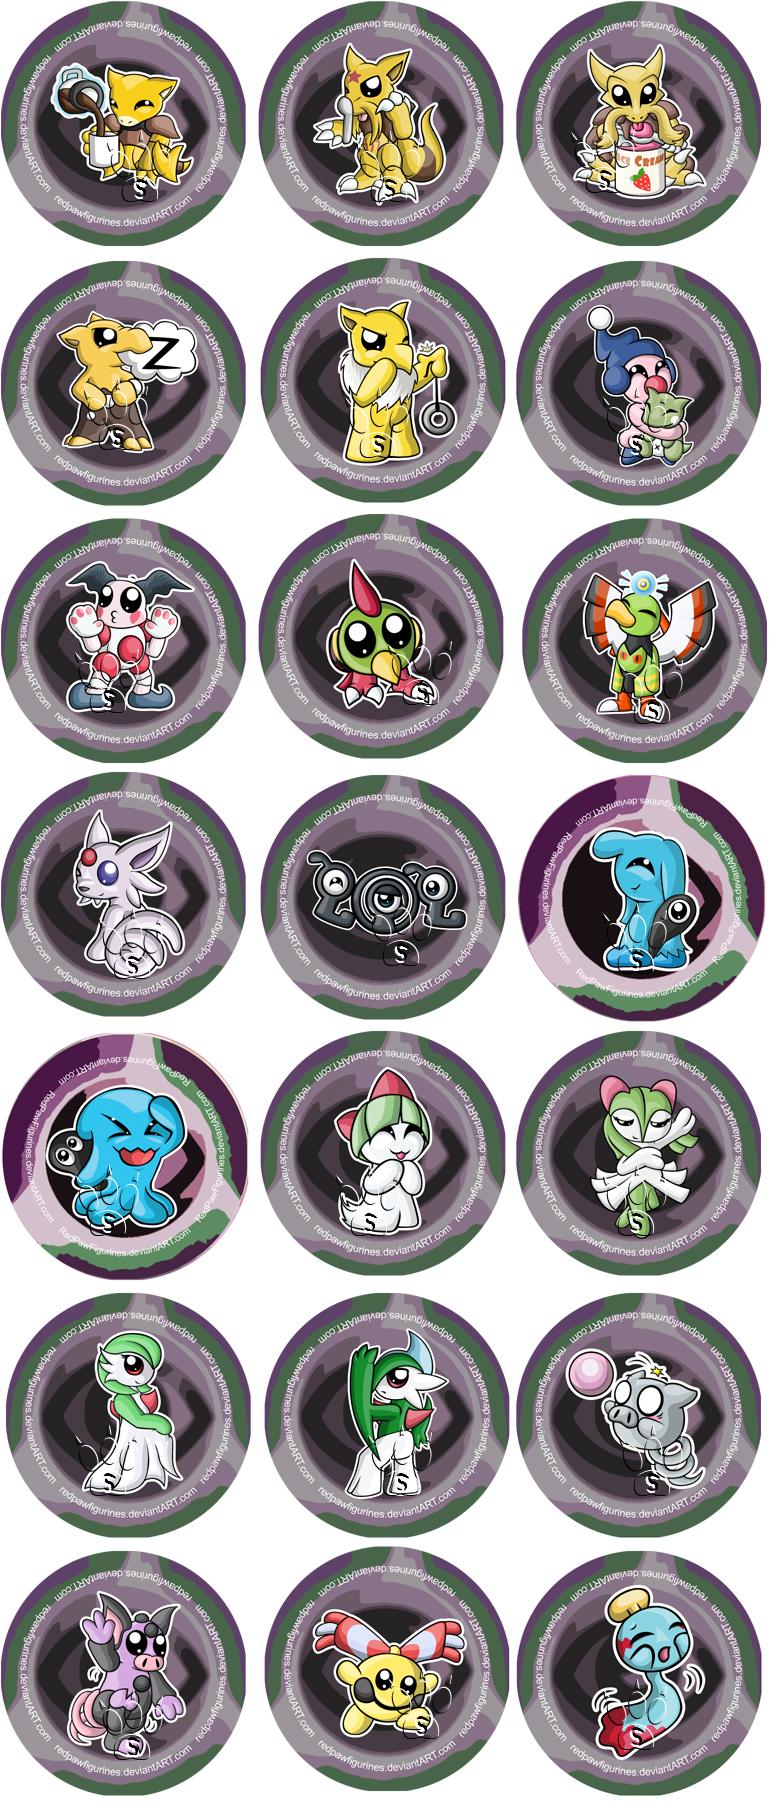 Psychic Type Pokemon Chibi Badges By Redpawdesigns On Deviantart